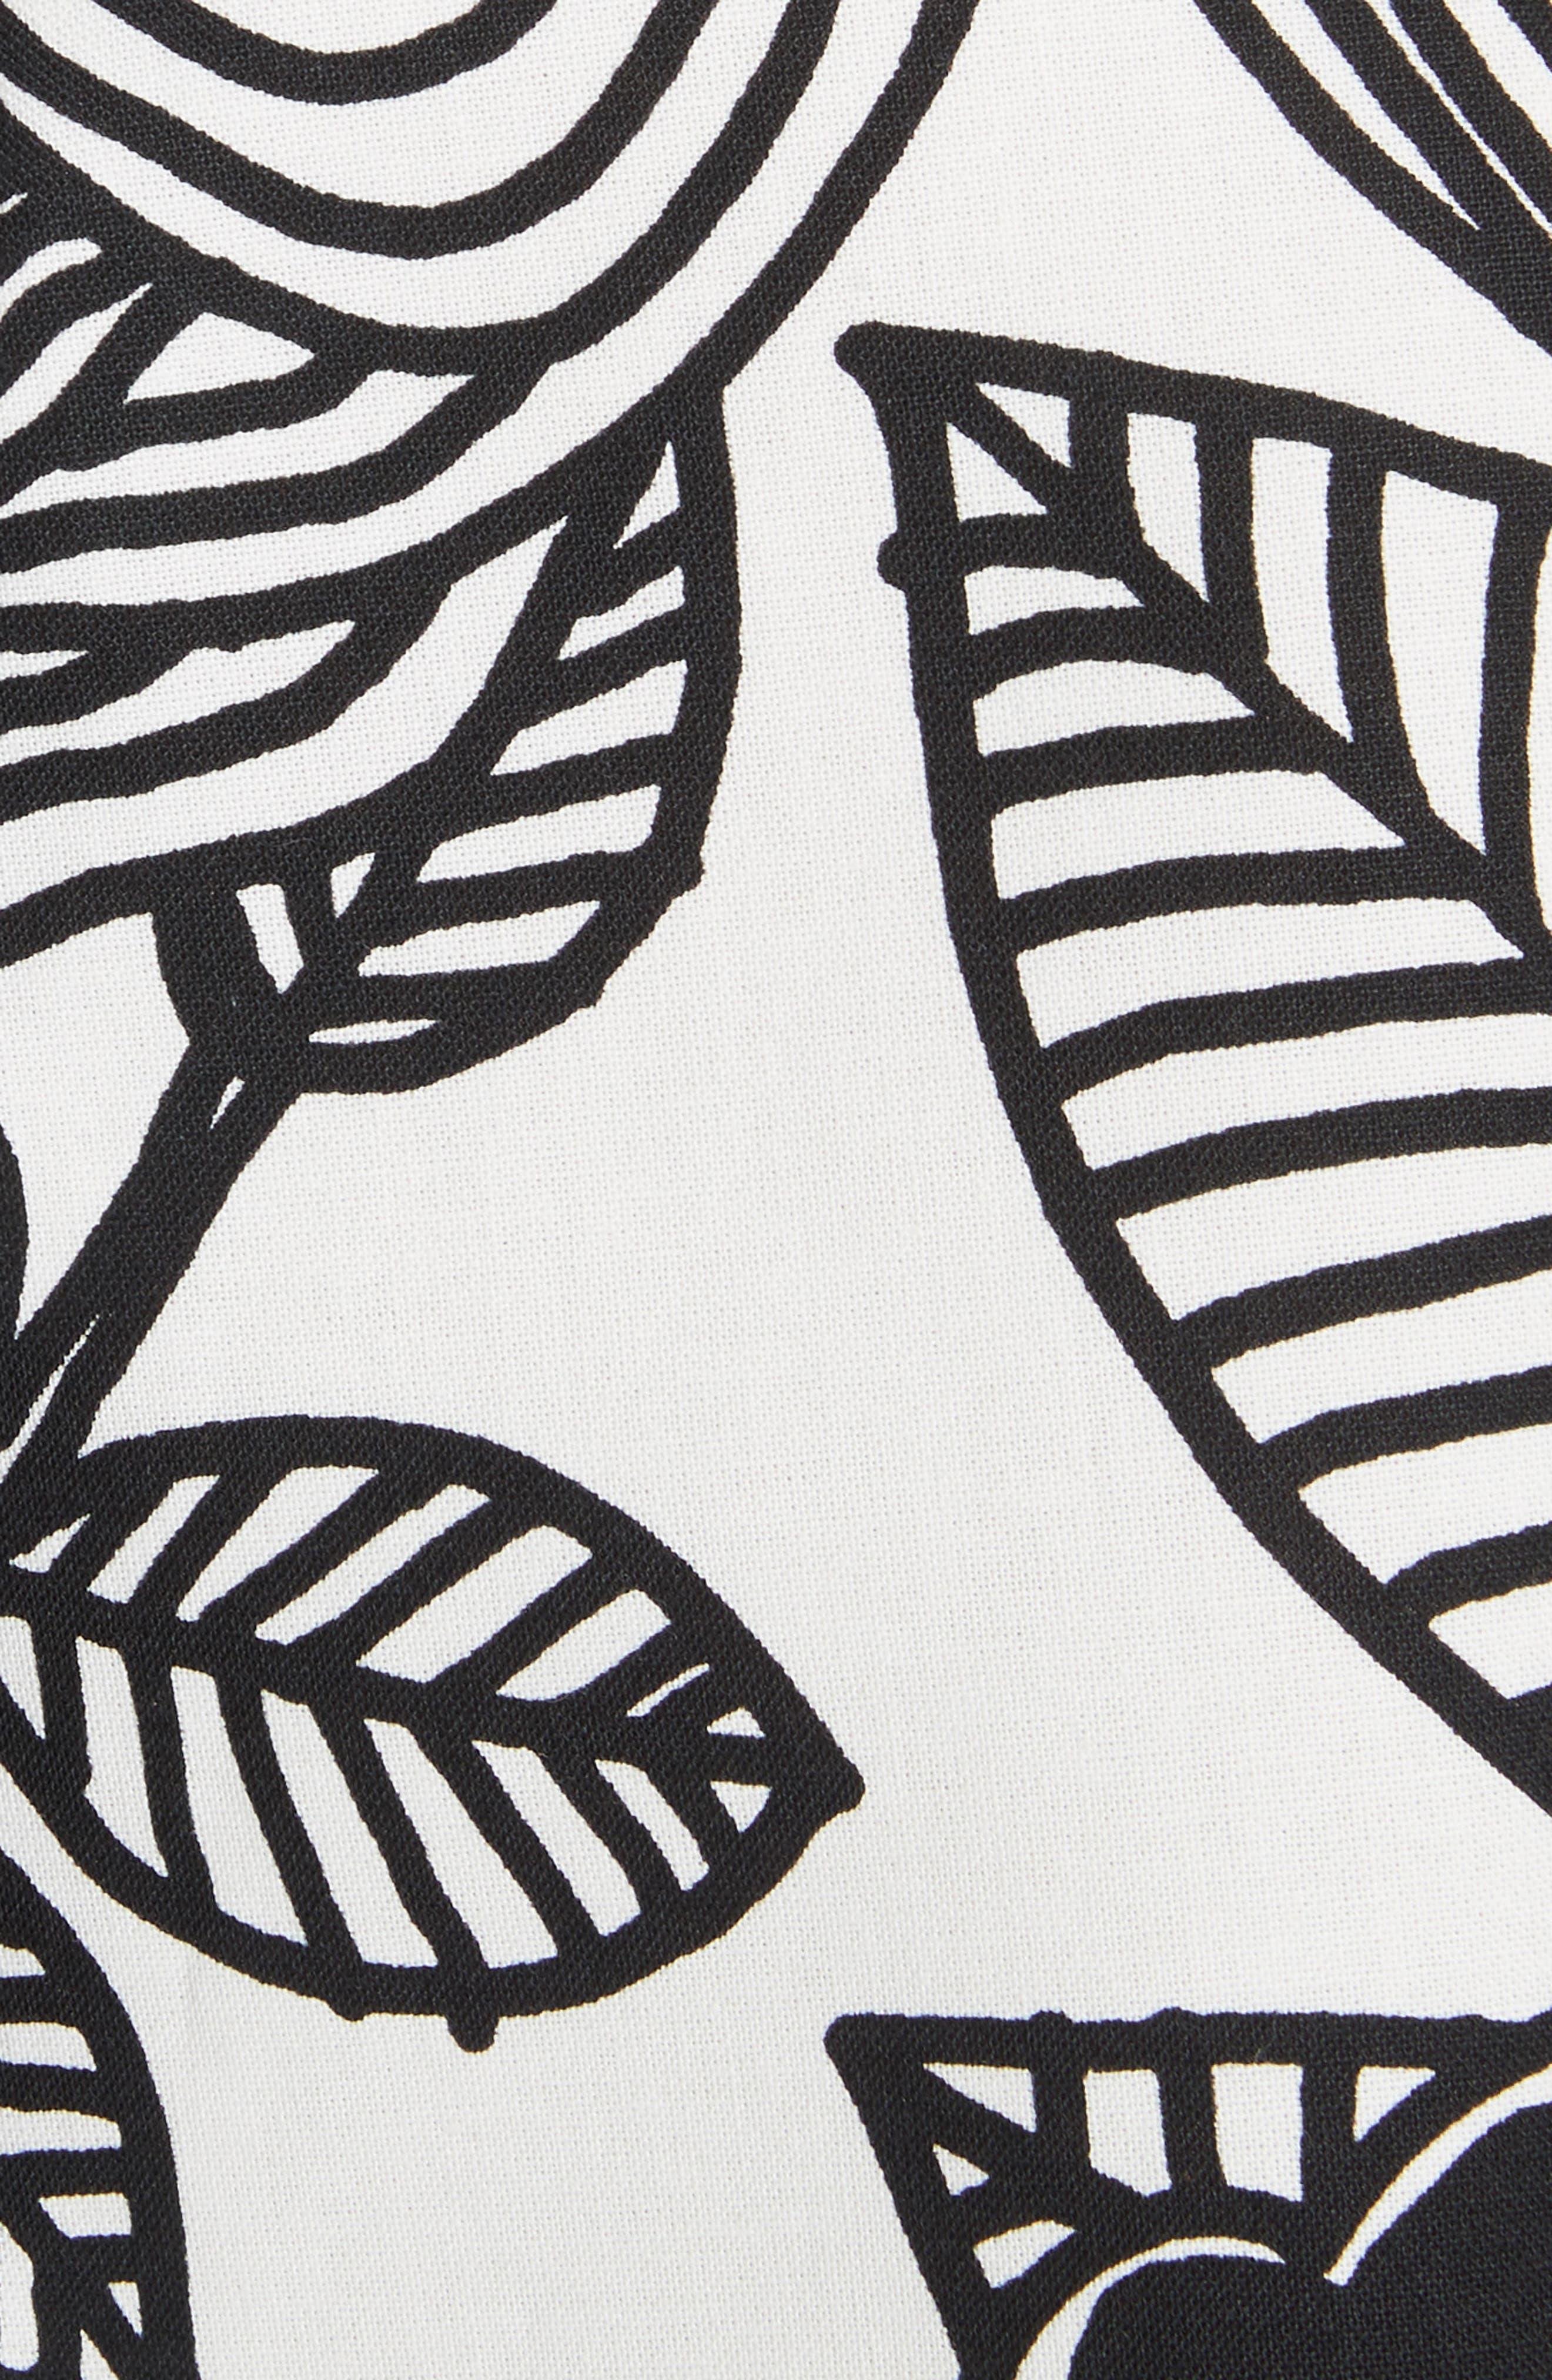 x Marimekko Vegetable Print Cotton Skirt,                             Alternate thumbnail 5, color,                             Wht/ Blk/ Ylw